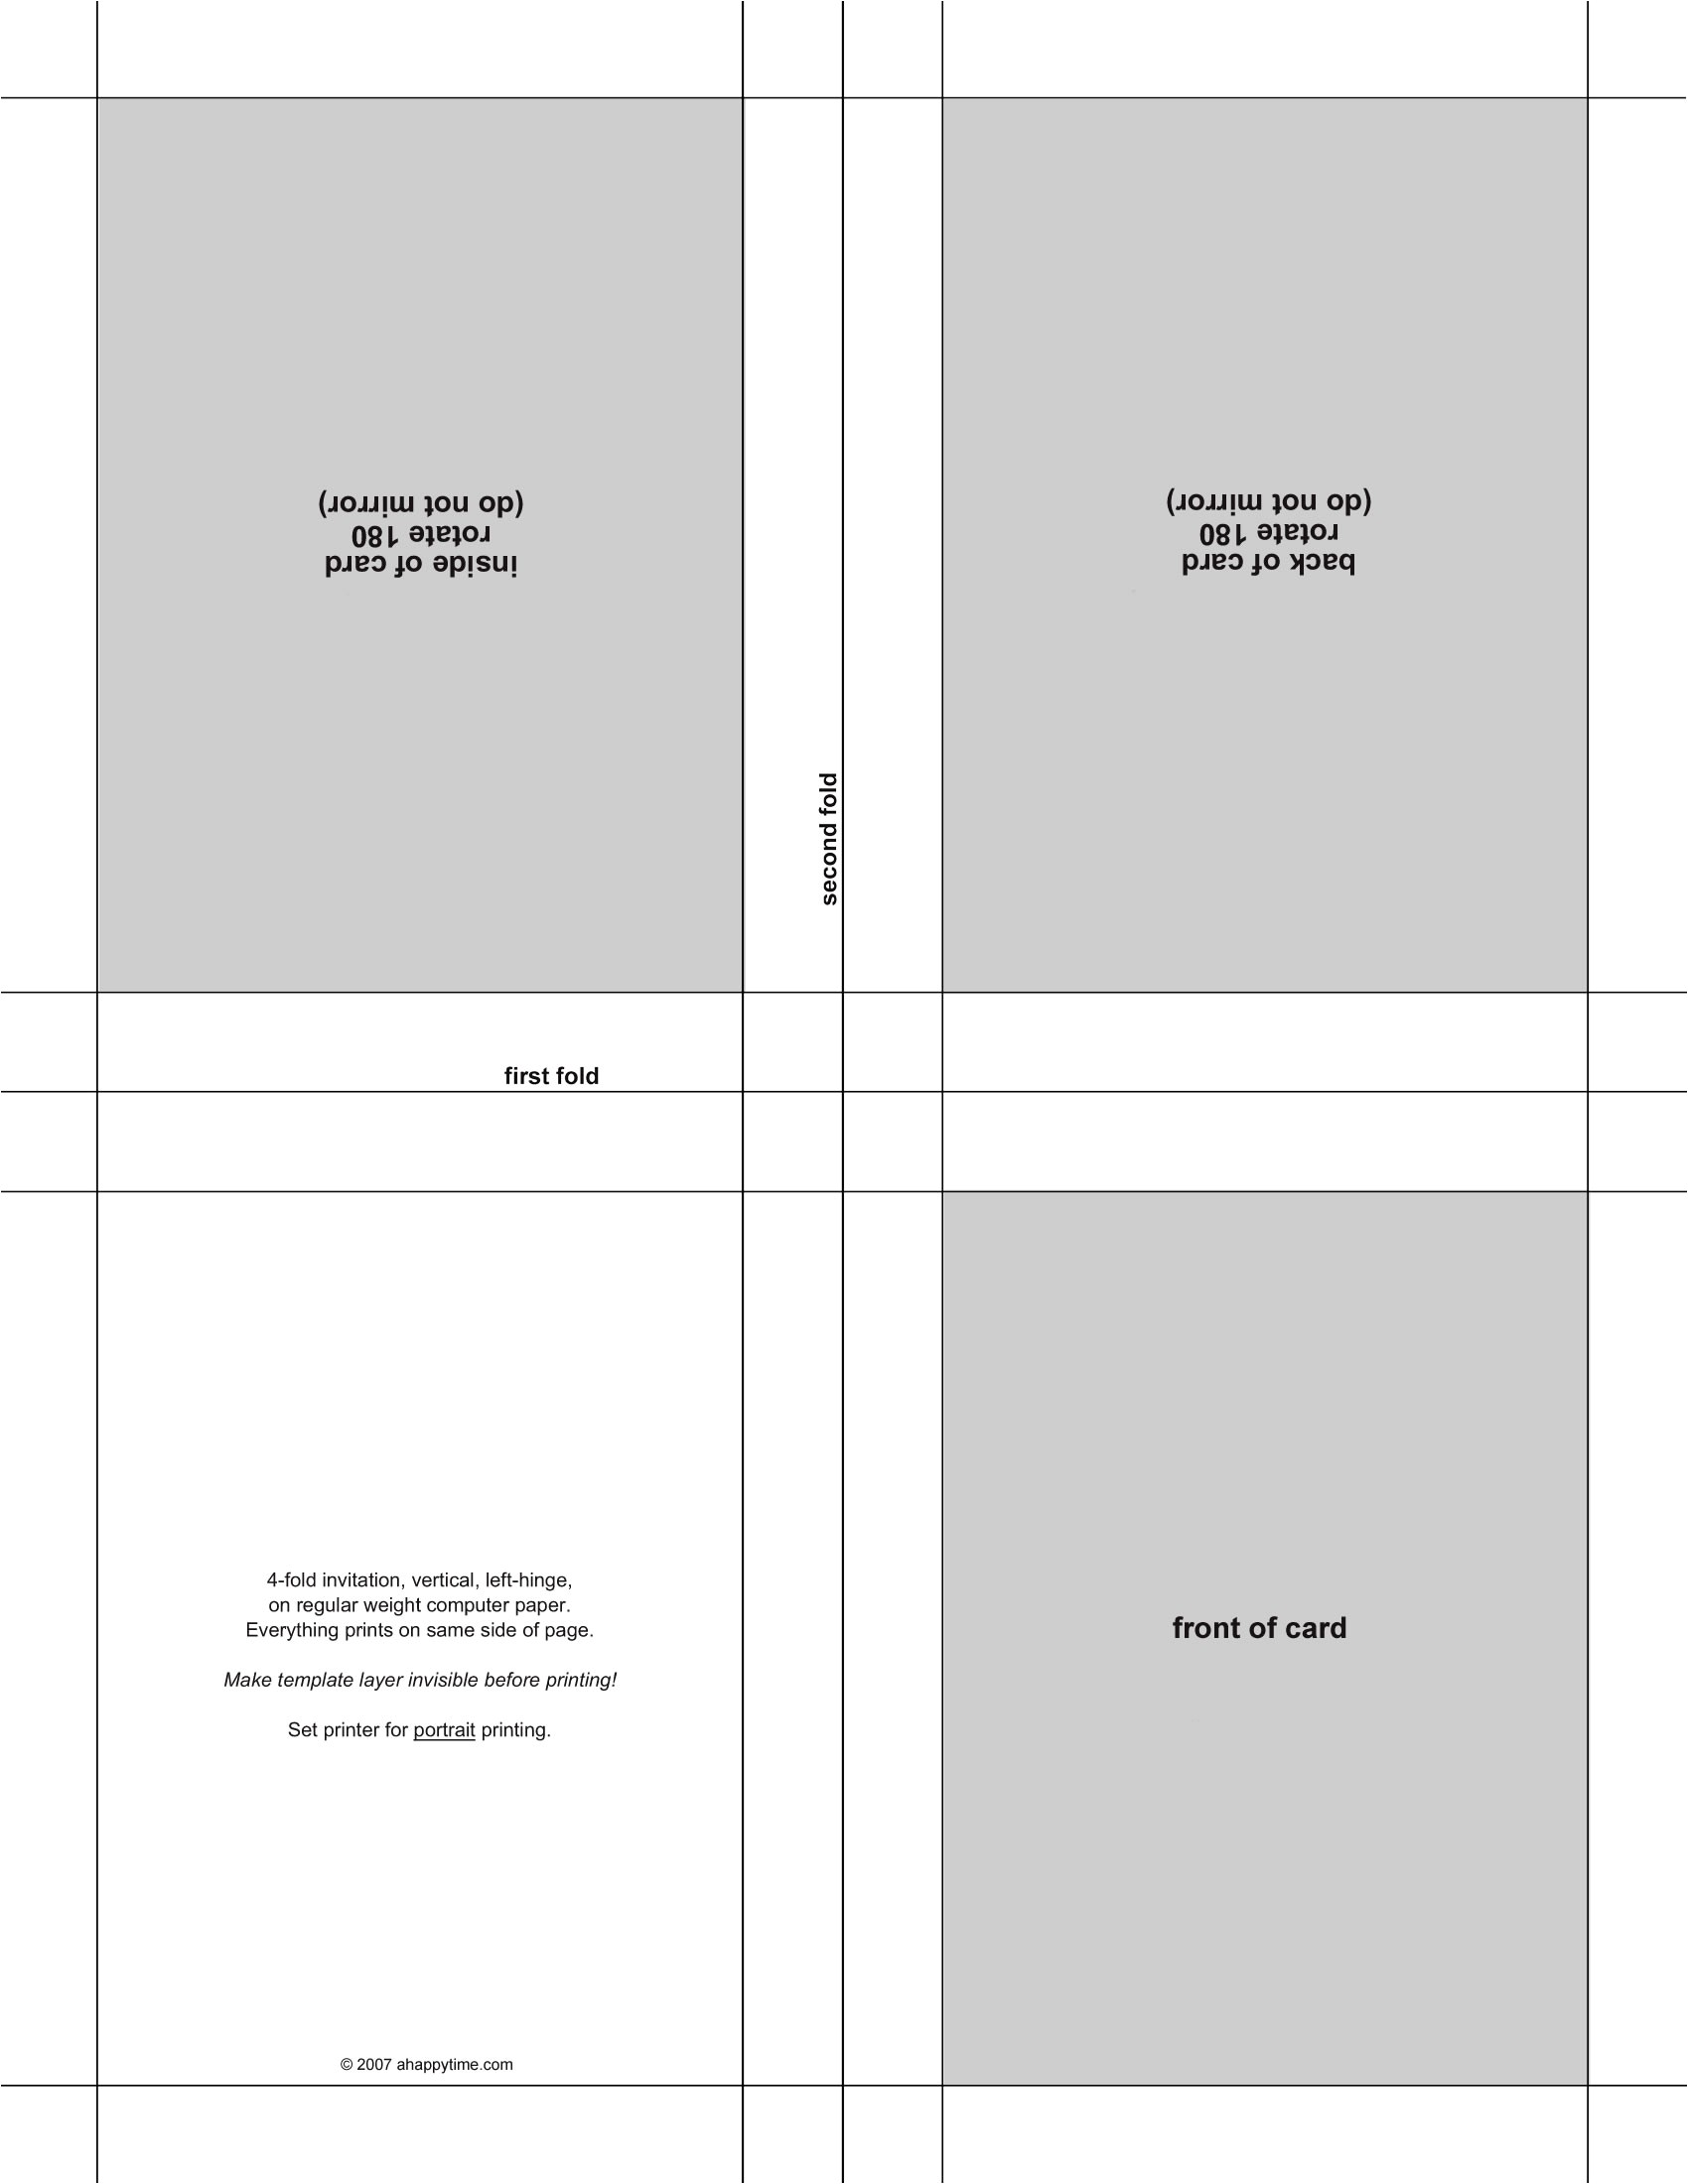 p postcard template 4 per page 123047